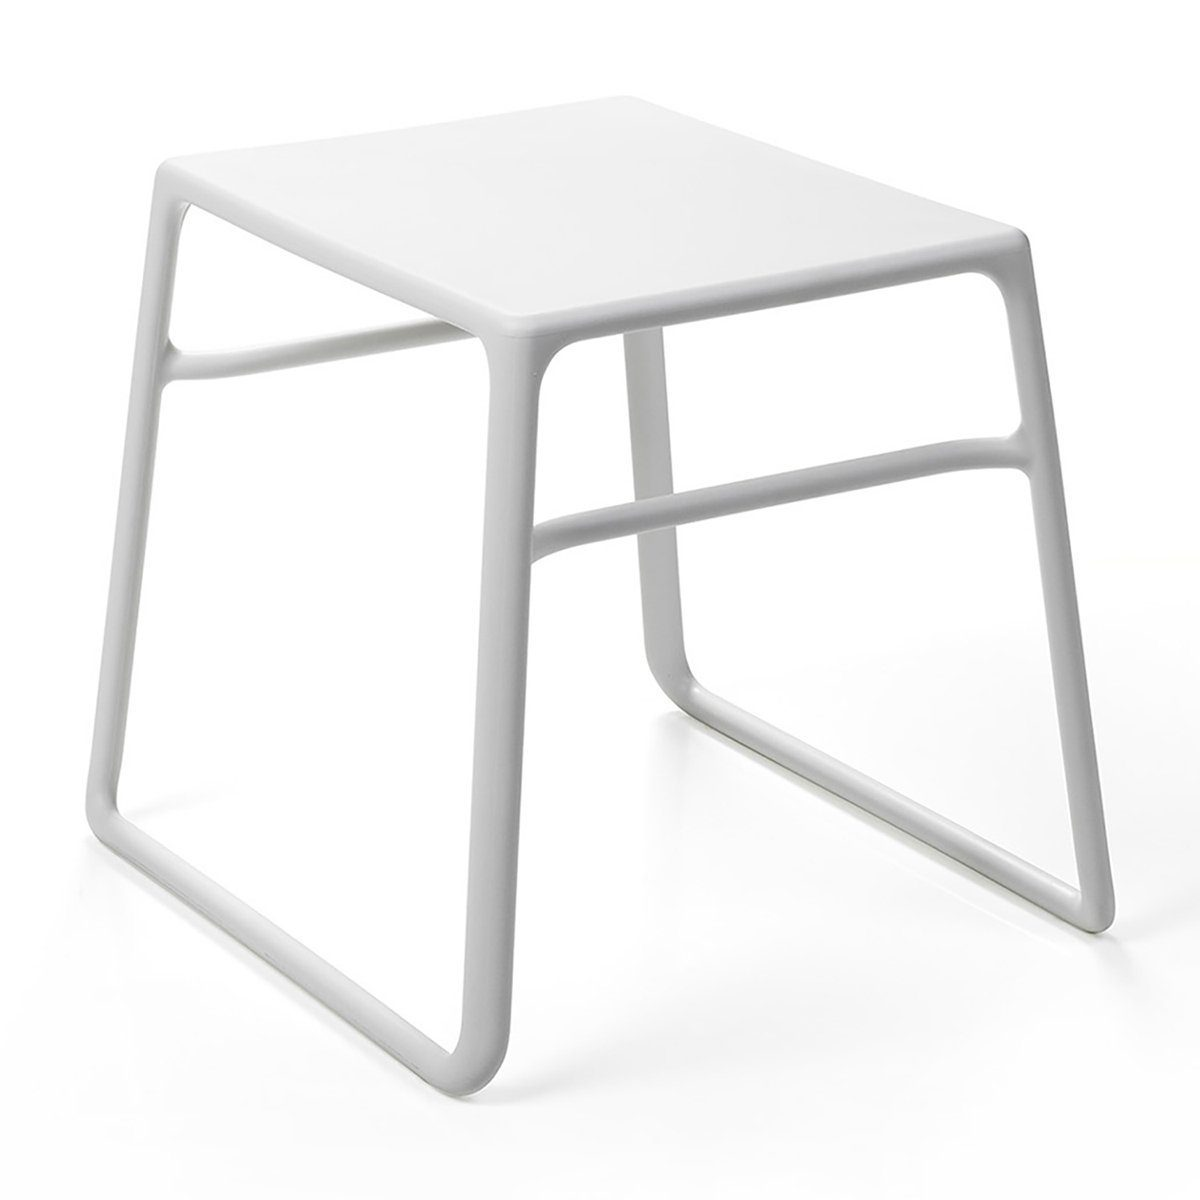 Pop sidobord från Nardi i vit plast.